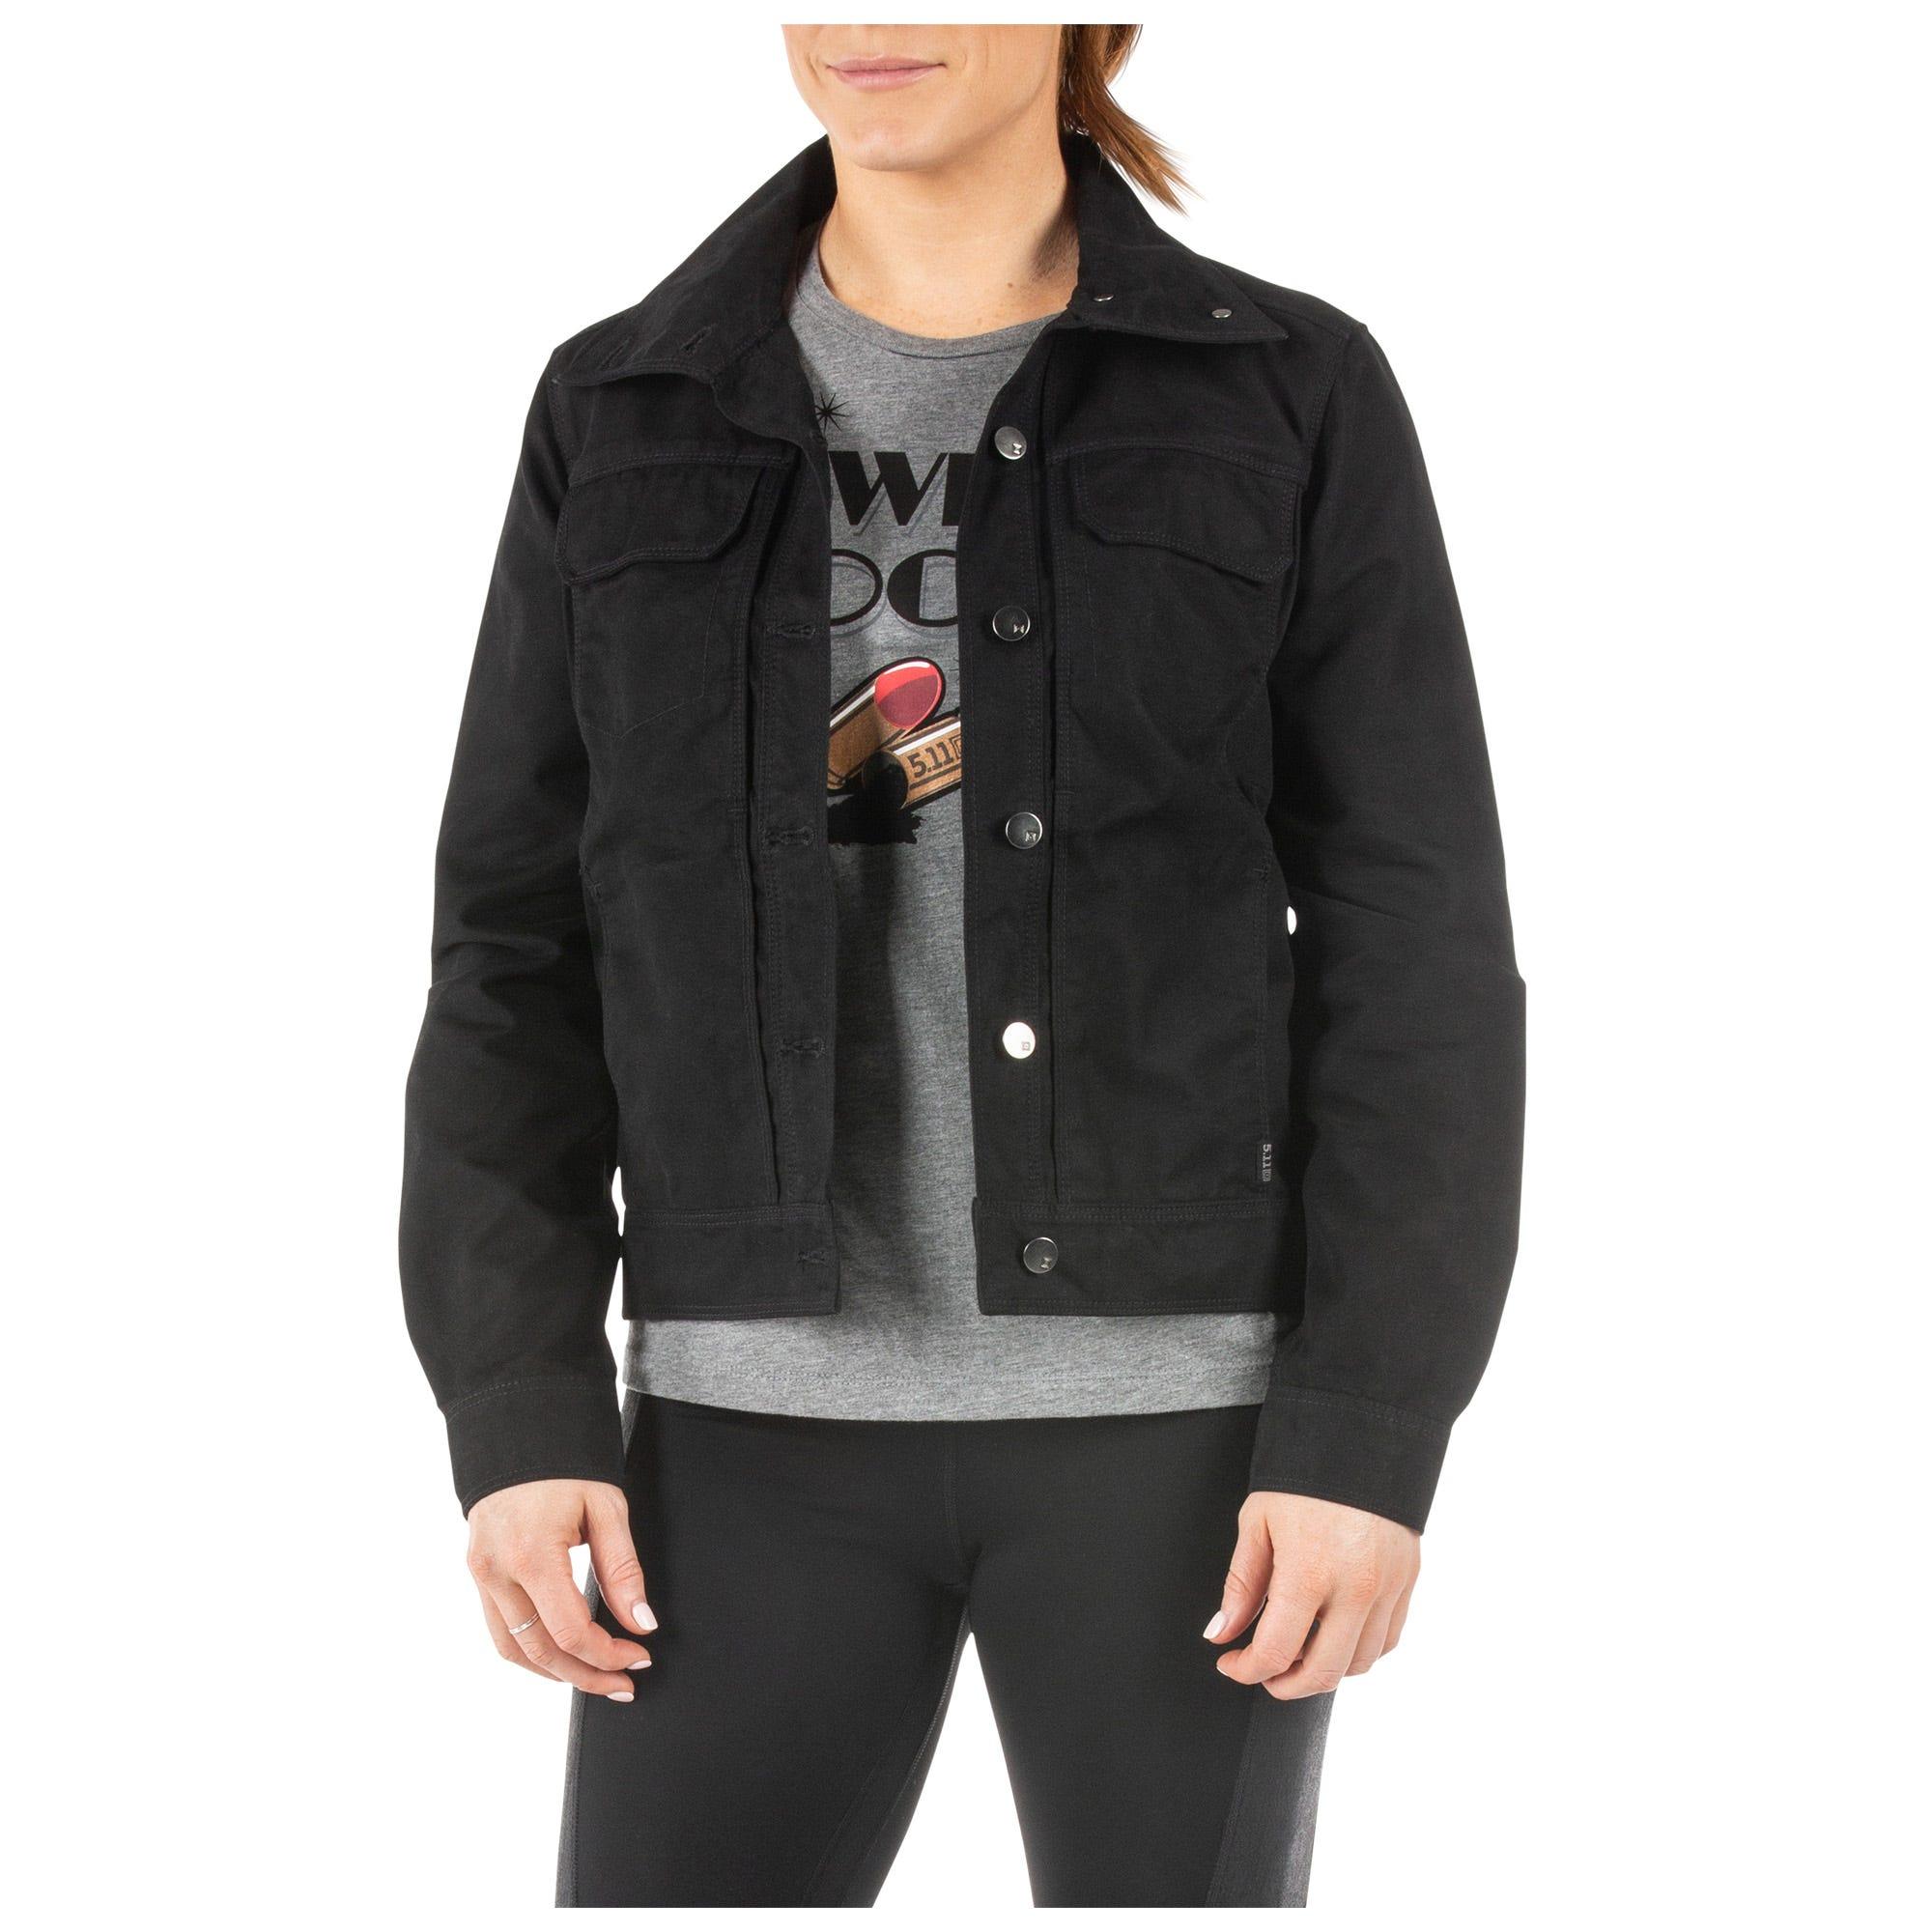 5.11 Tactical Women's Penelope Canvas Jacket